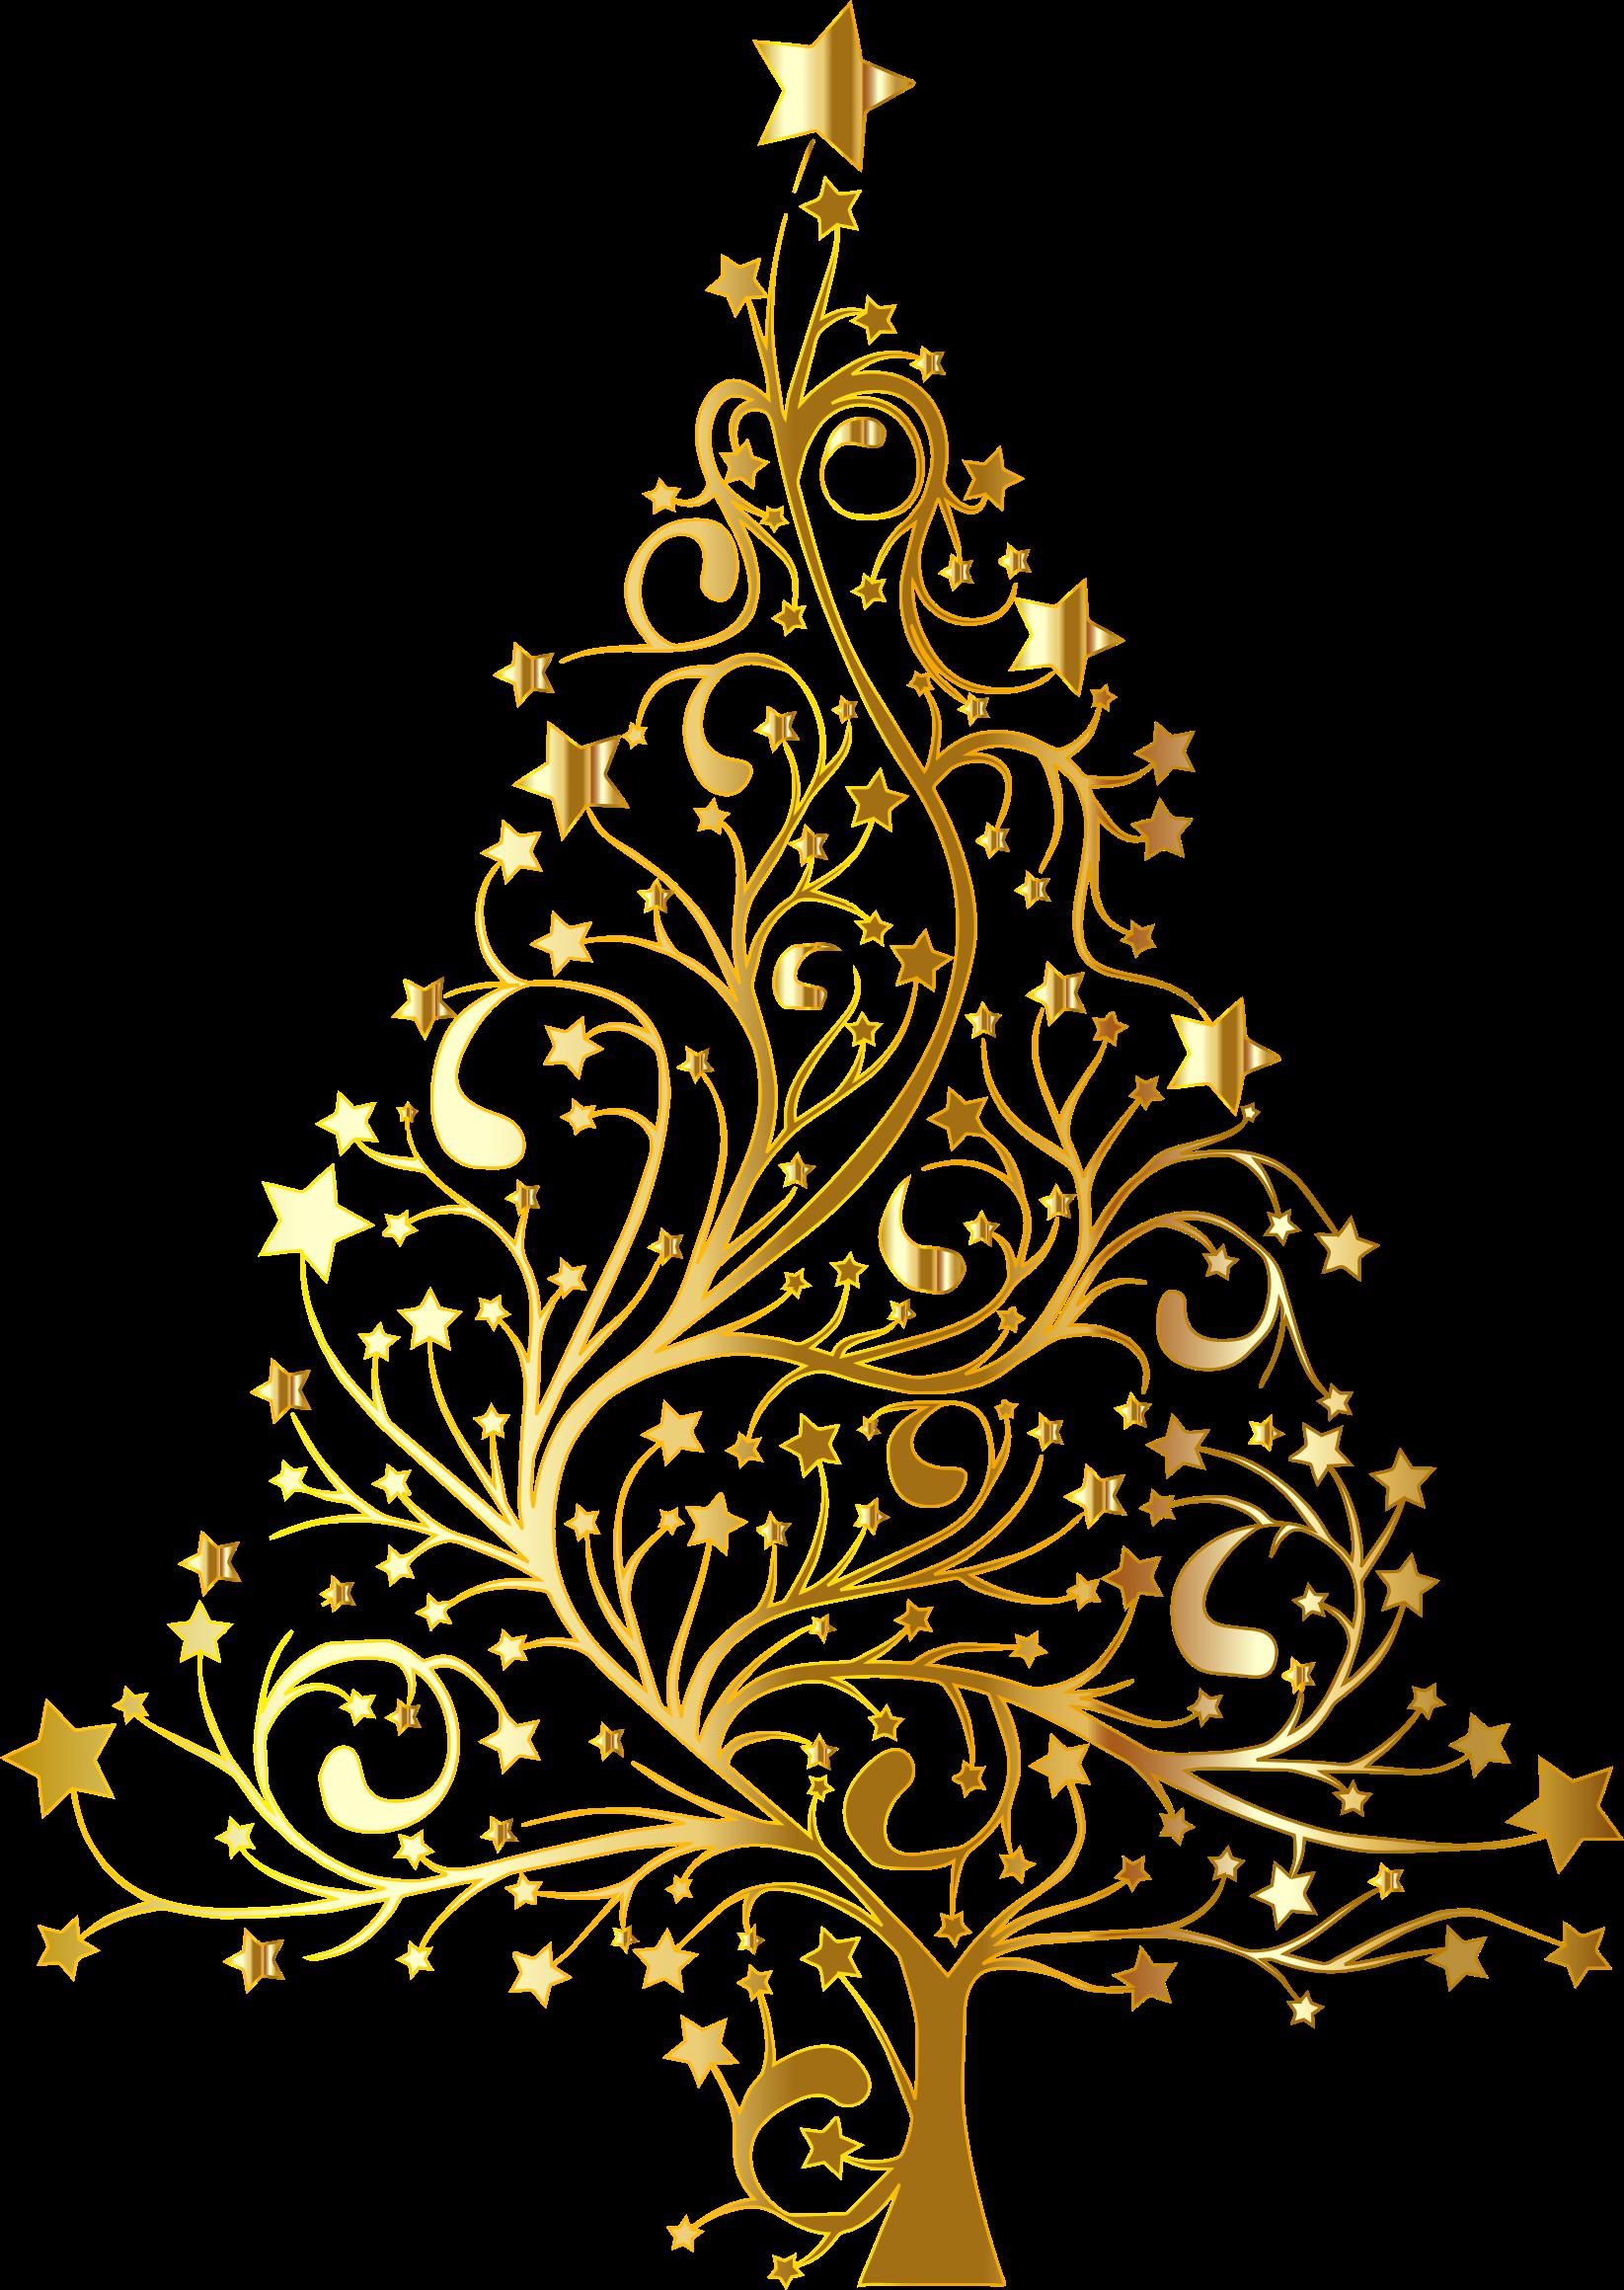 Flourish clipart christmas. Starry tree gold no